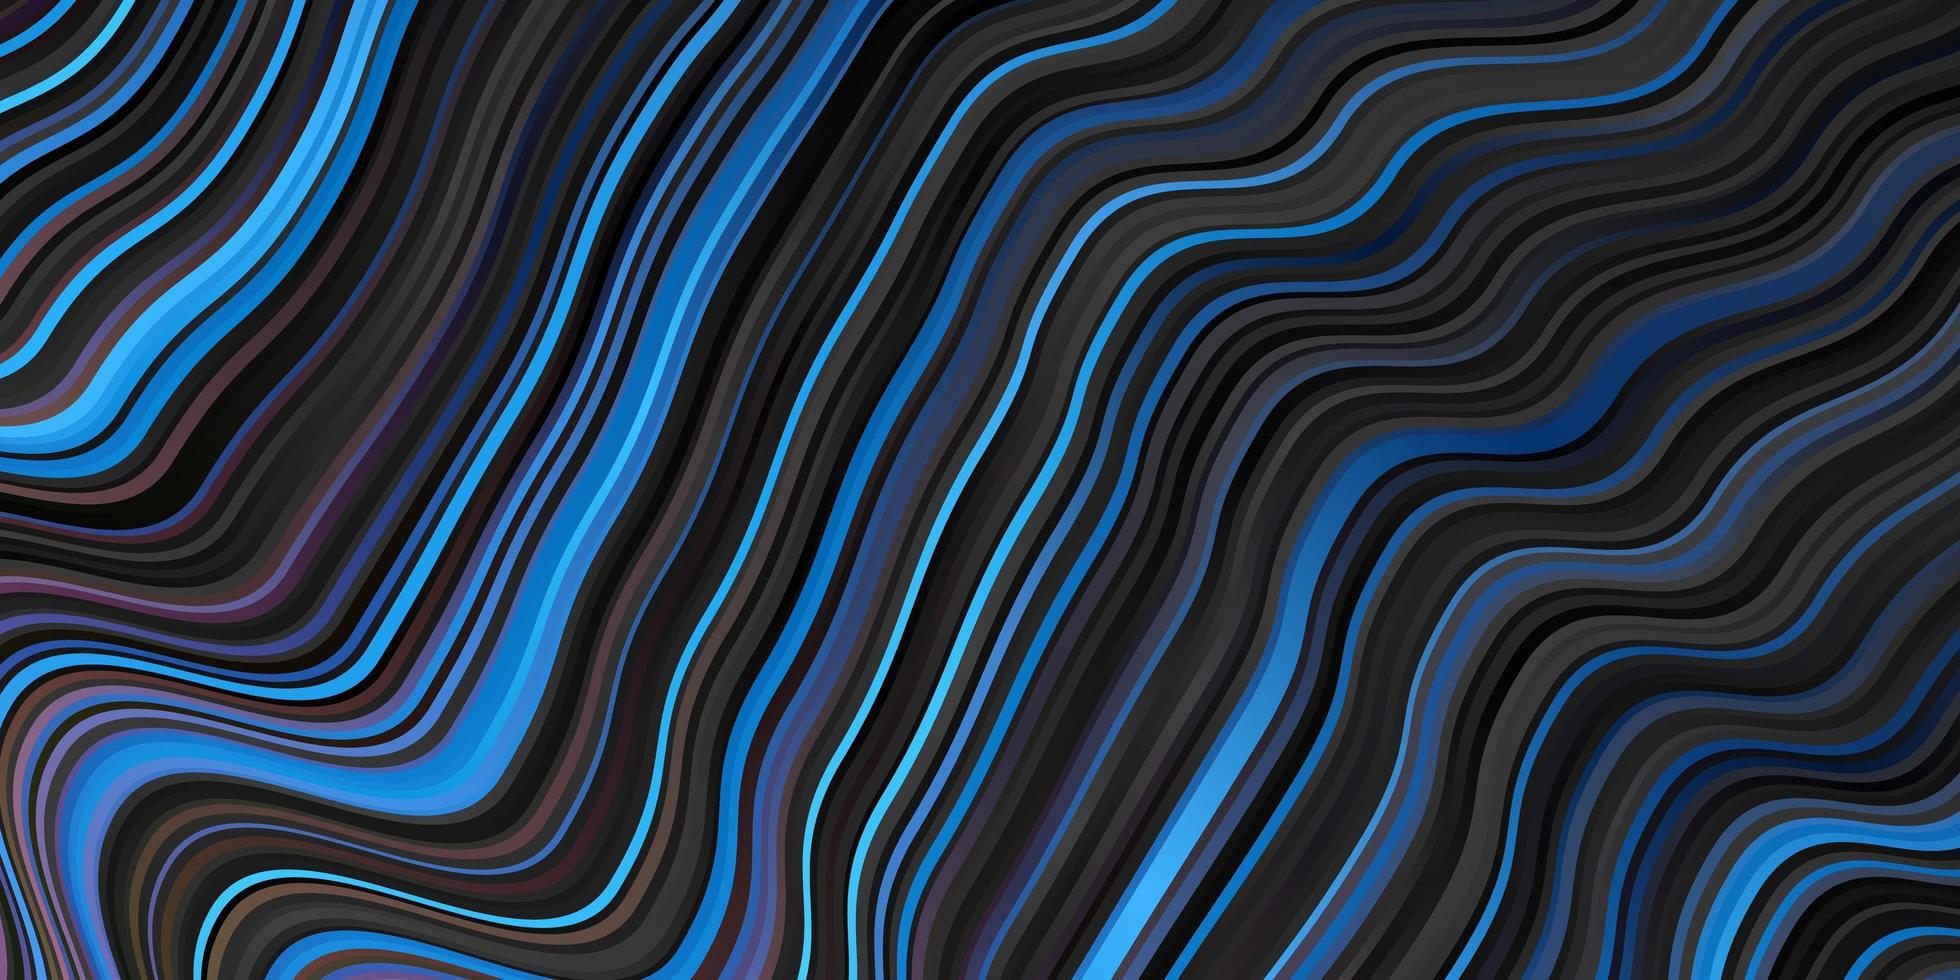 Dark Multicolor vector pattern with wry lines.